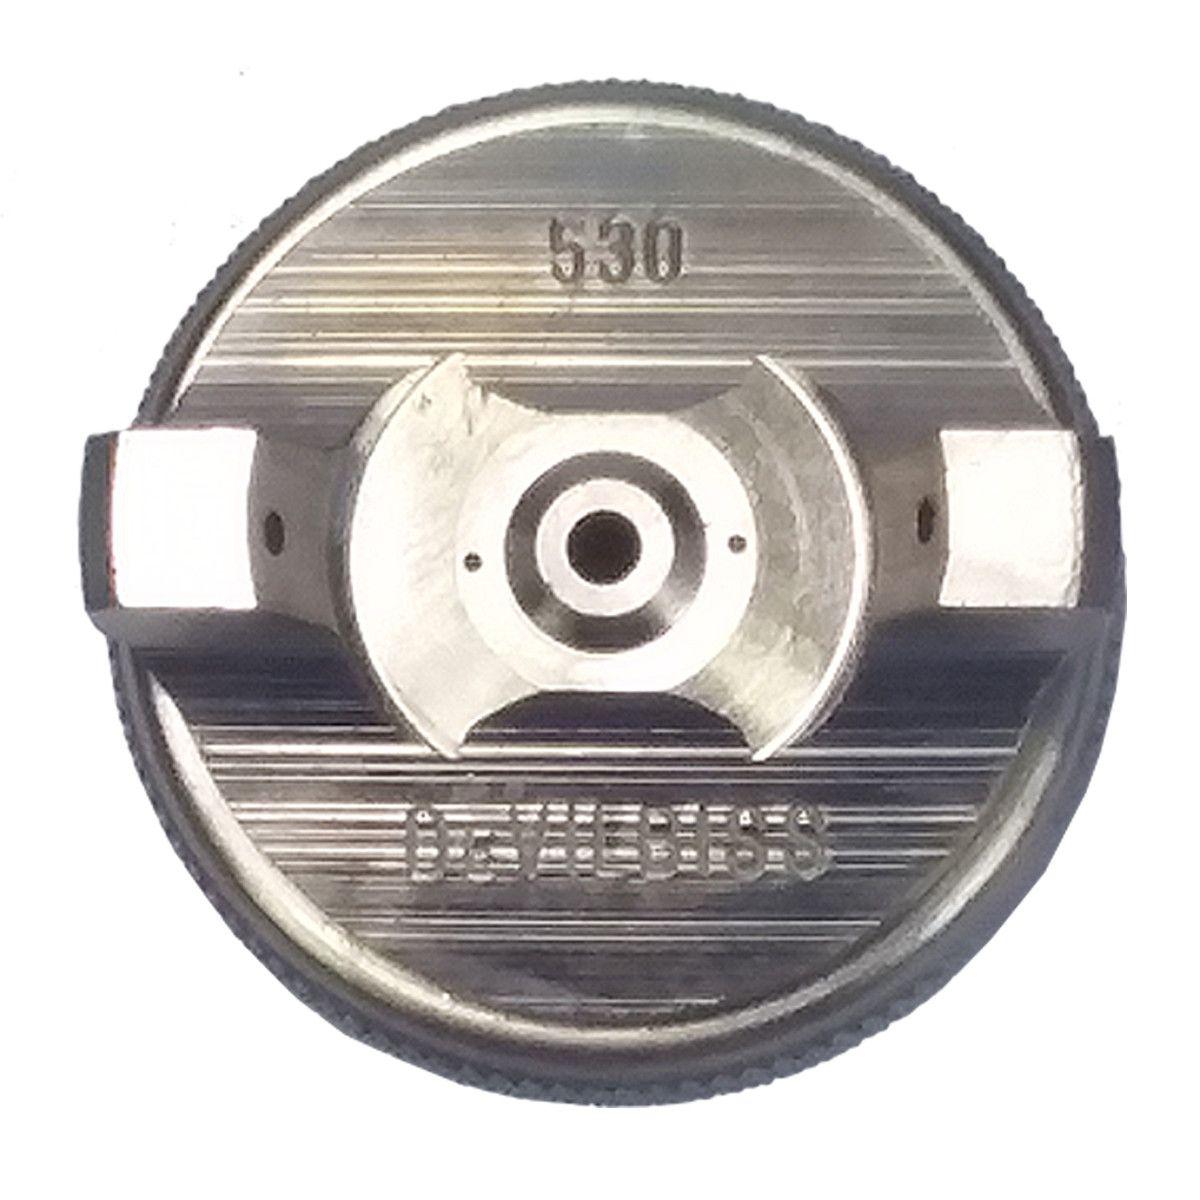 CAPA DE AR N 530 BSK-530 SGA-902 DEVILBISS